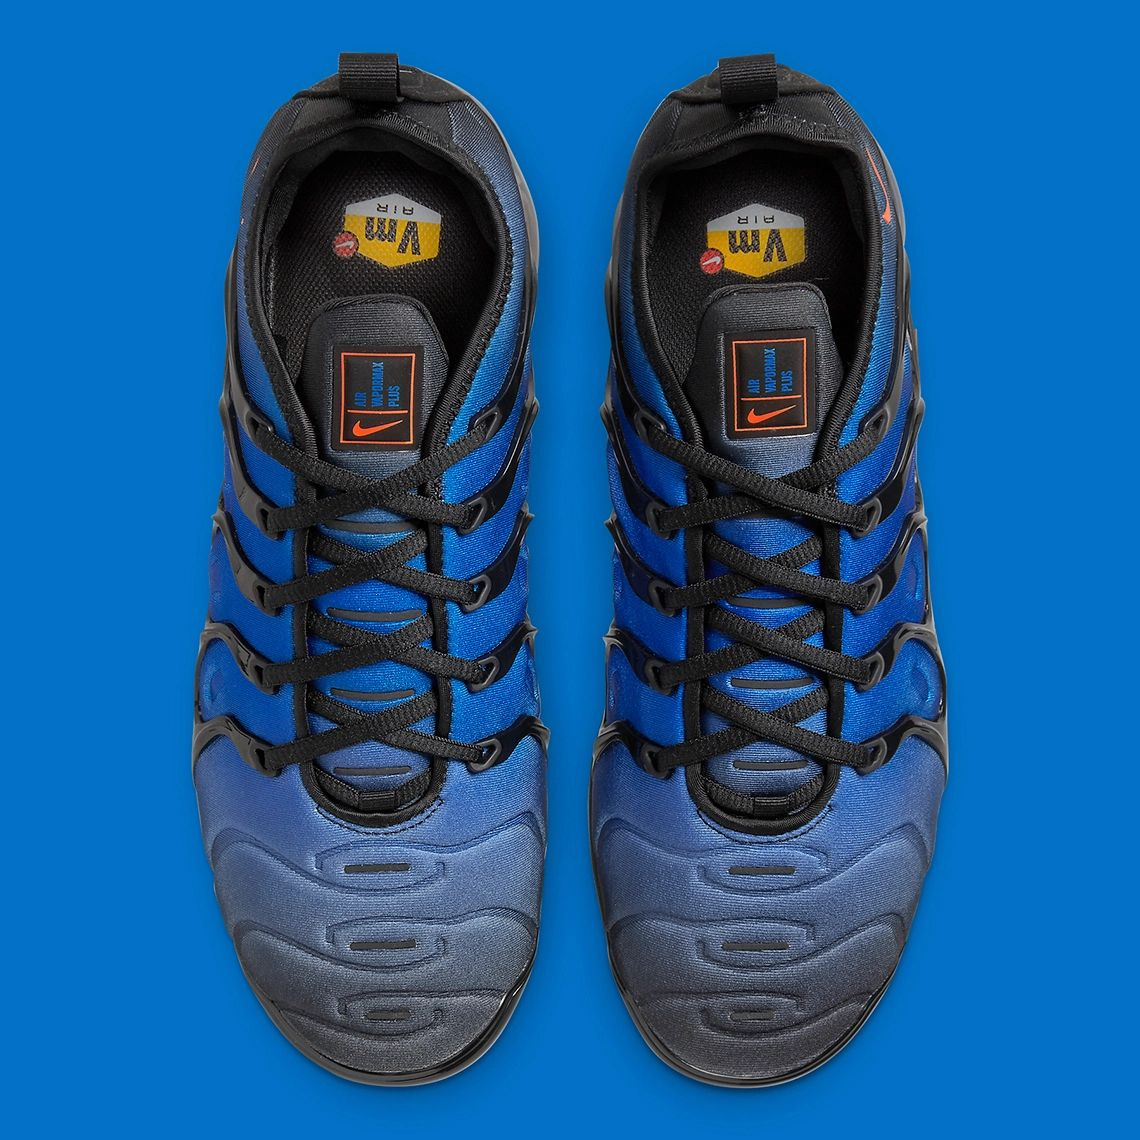 Nike,Air VaporMax Plus,DO6679-  炫酷渐变鞋面!全新配色 Air VaporMax Plus 实物曝光!